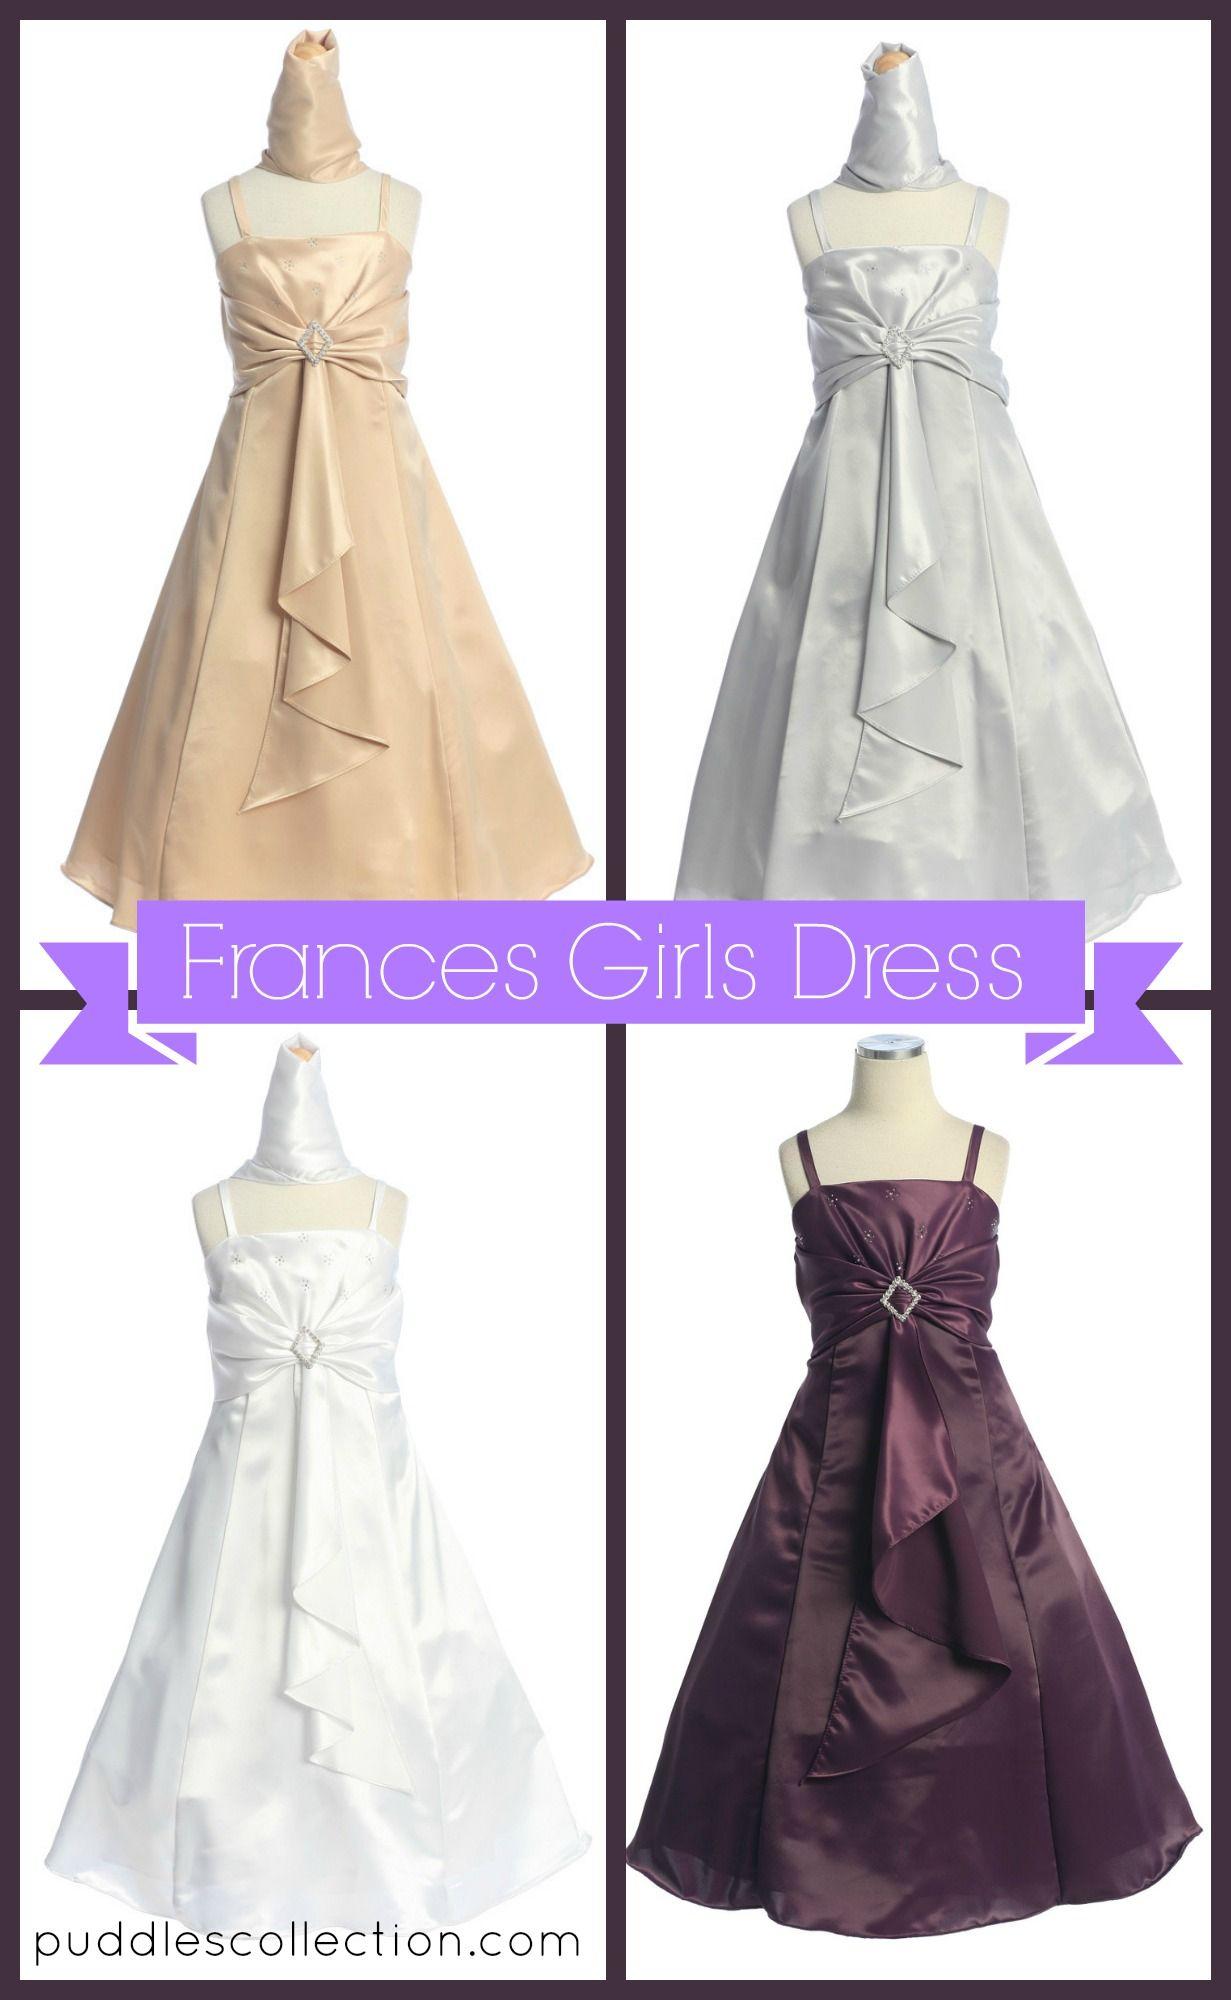 Frances girls dress kidsu formal wear pinterest girls dresses